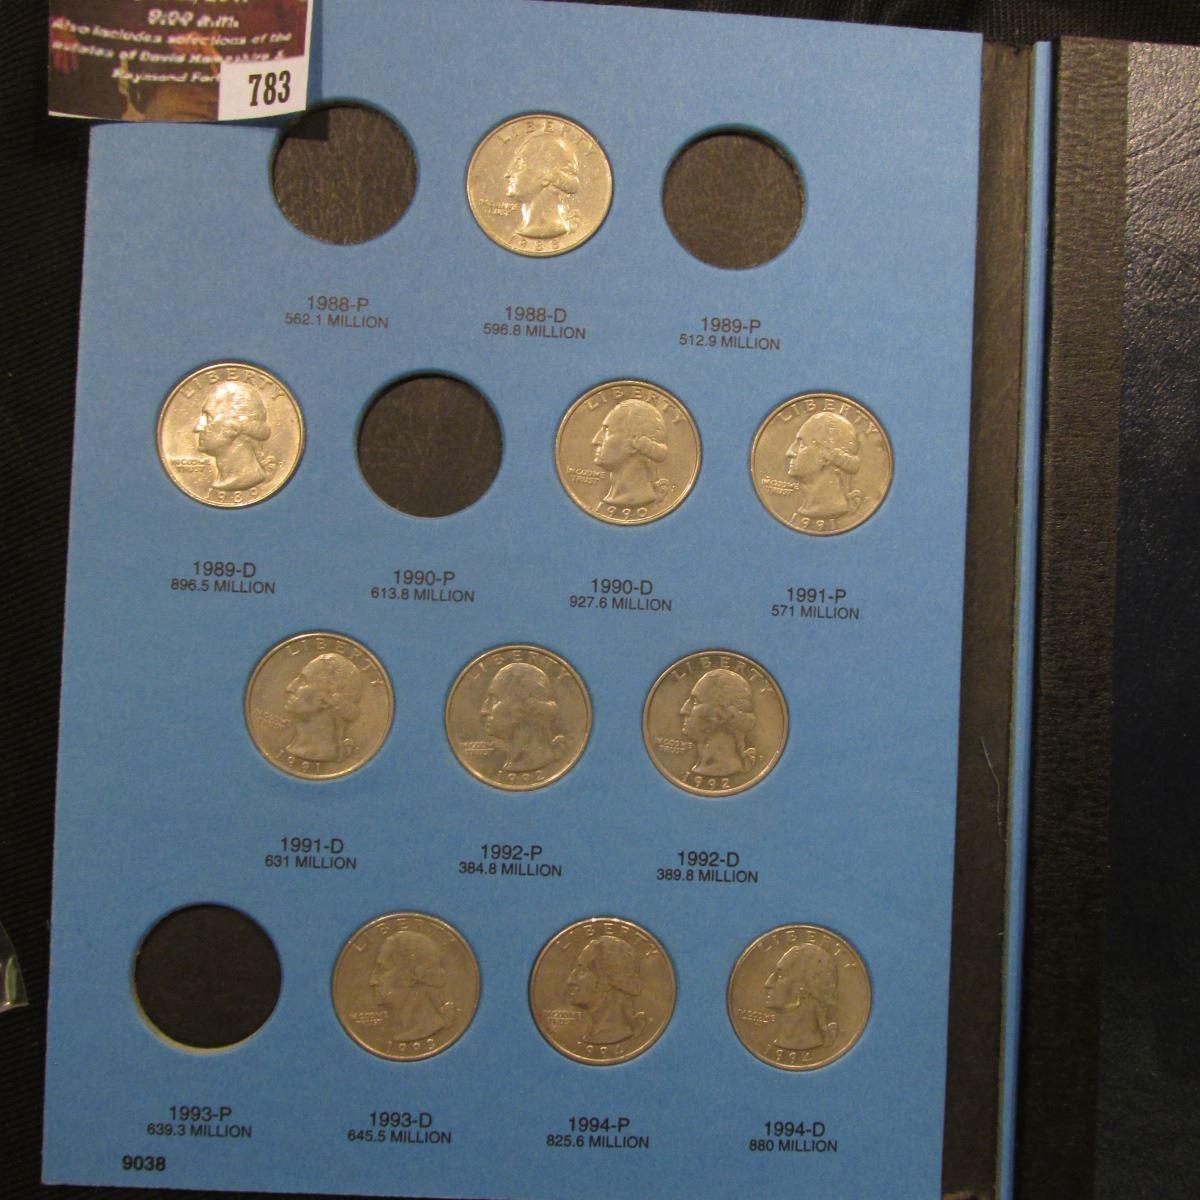 783 1988-98 Partial Set of Washington Quarters in a blue Whitman folder